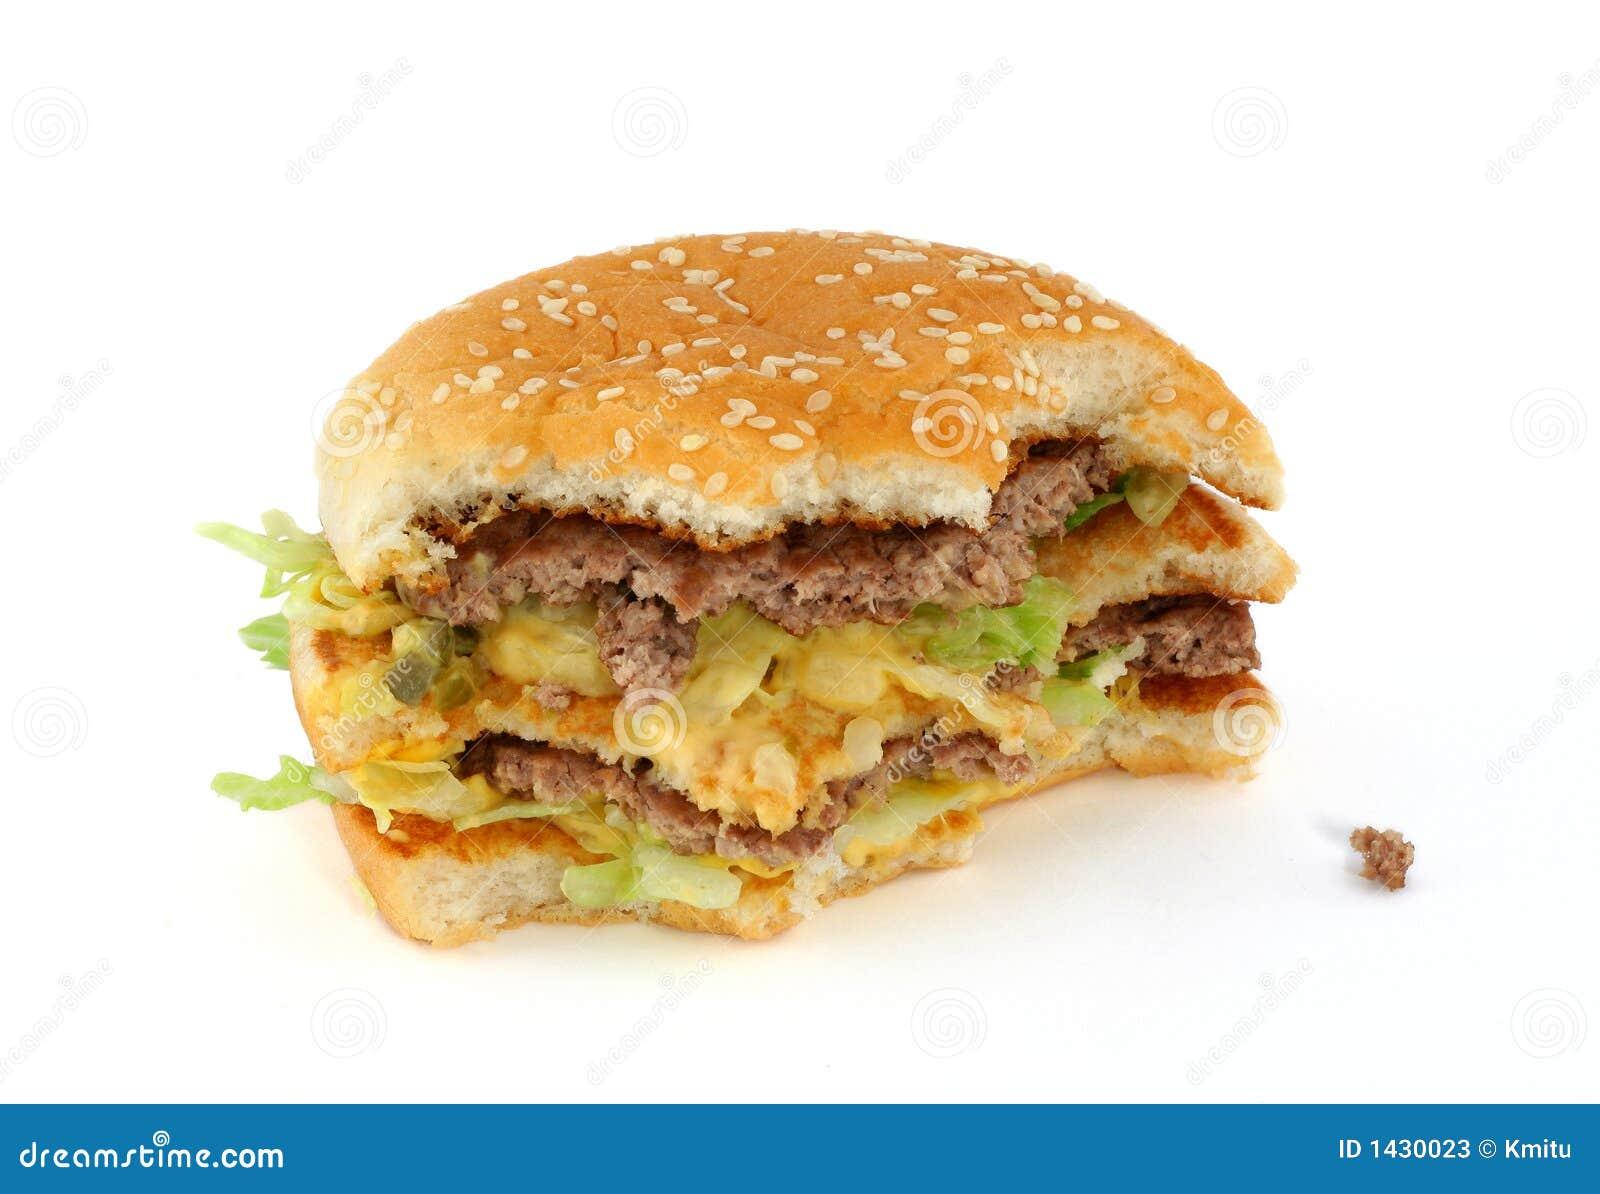 Half eaten Delicious Hamburger Stock Photos Image 1430023